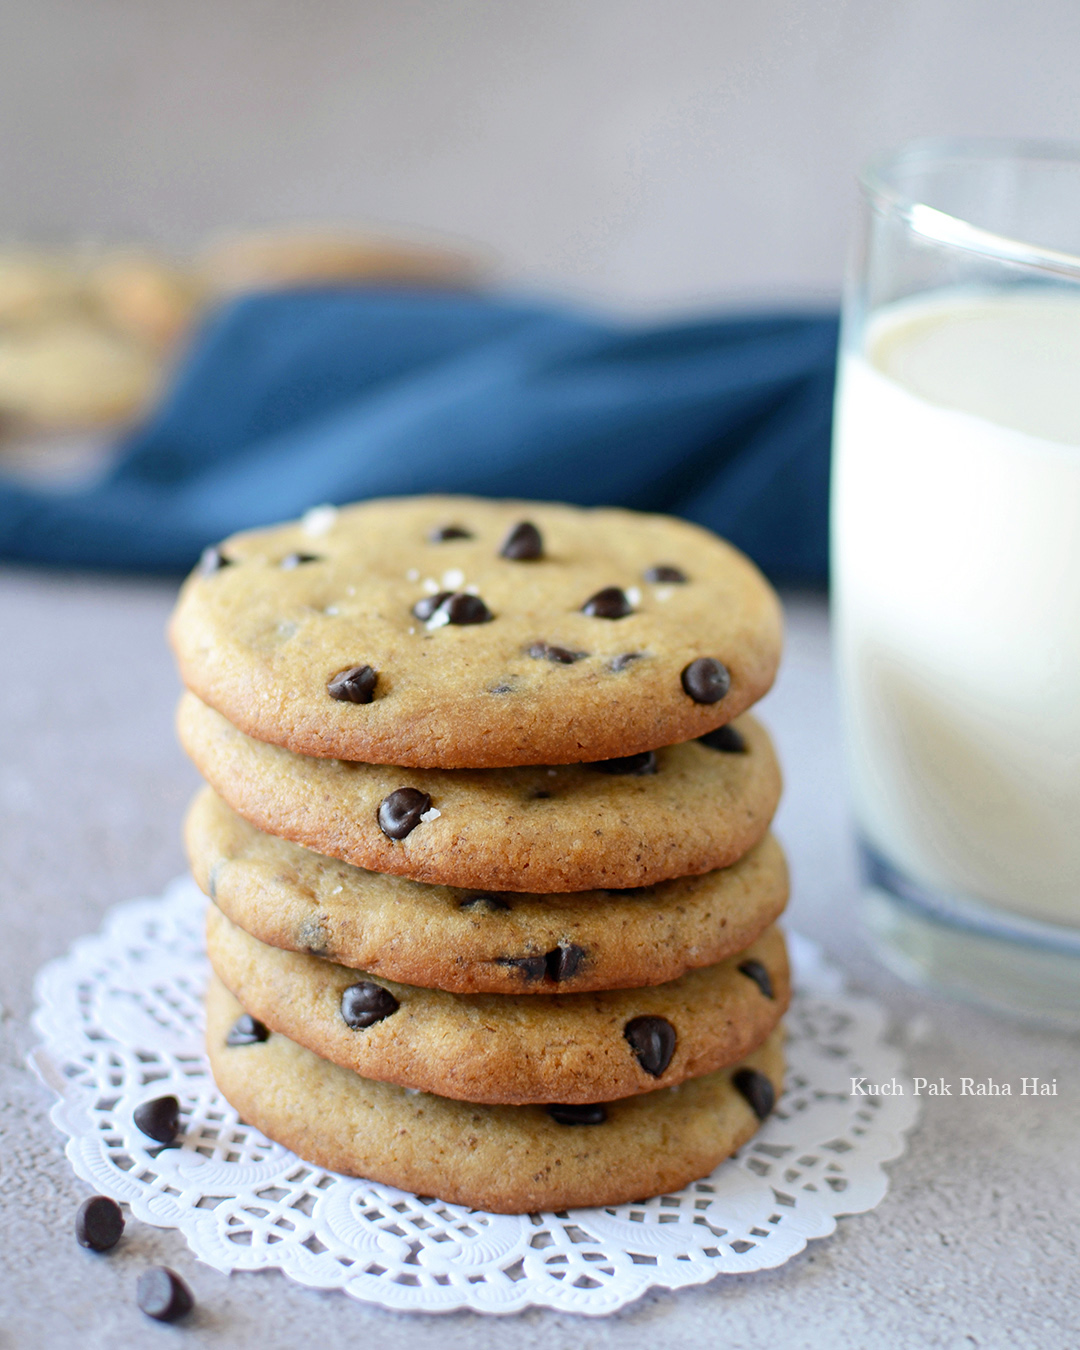 Eggless Choco Chip Cookies Recipe